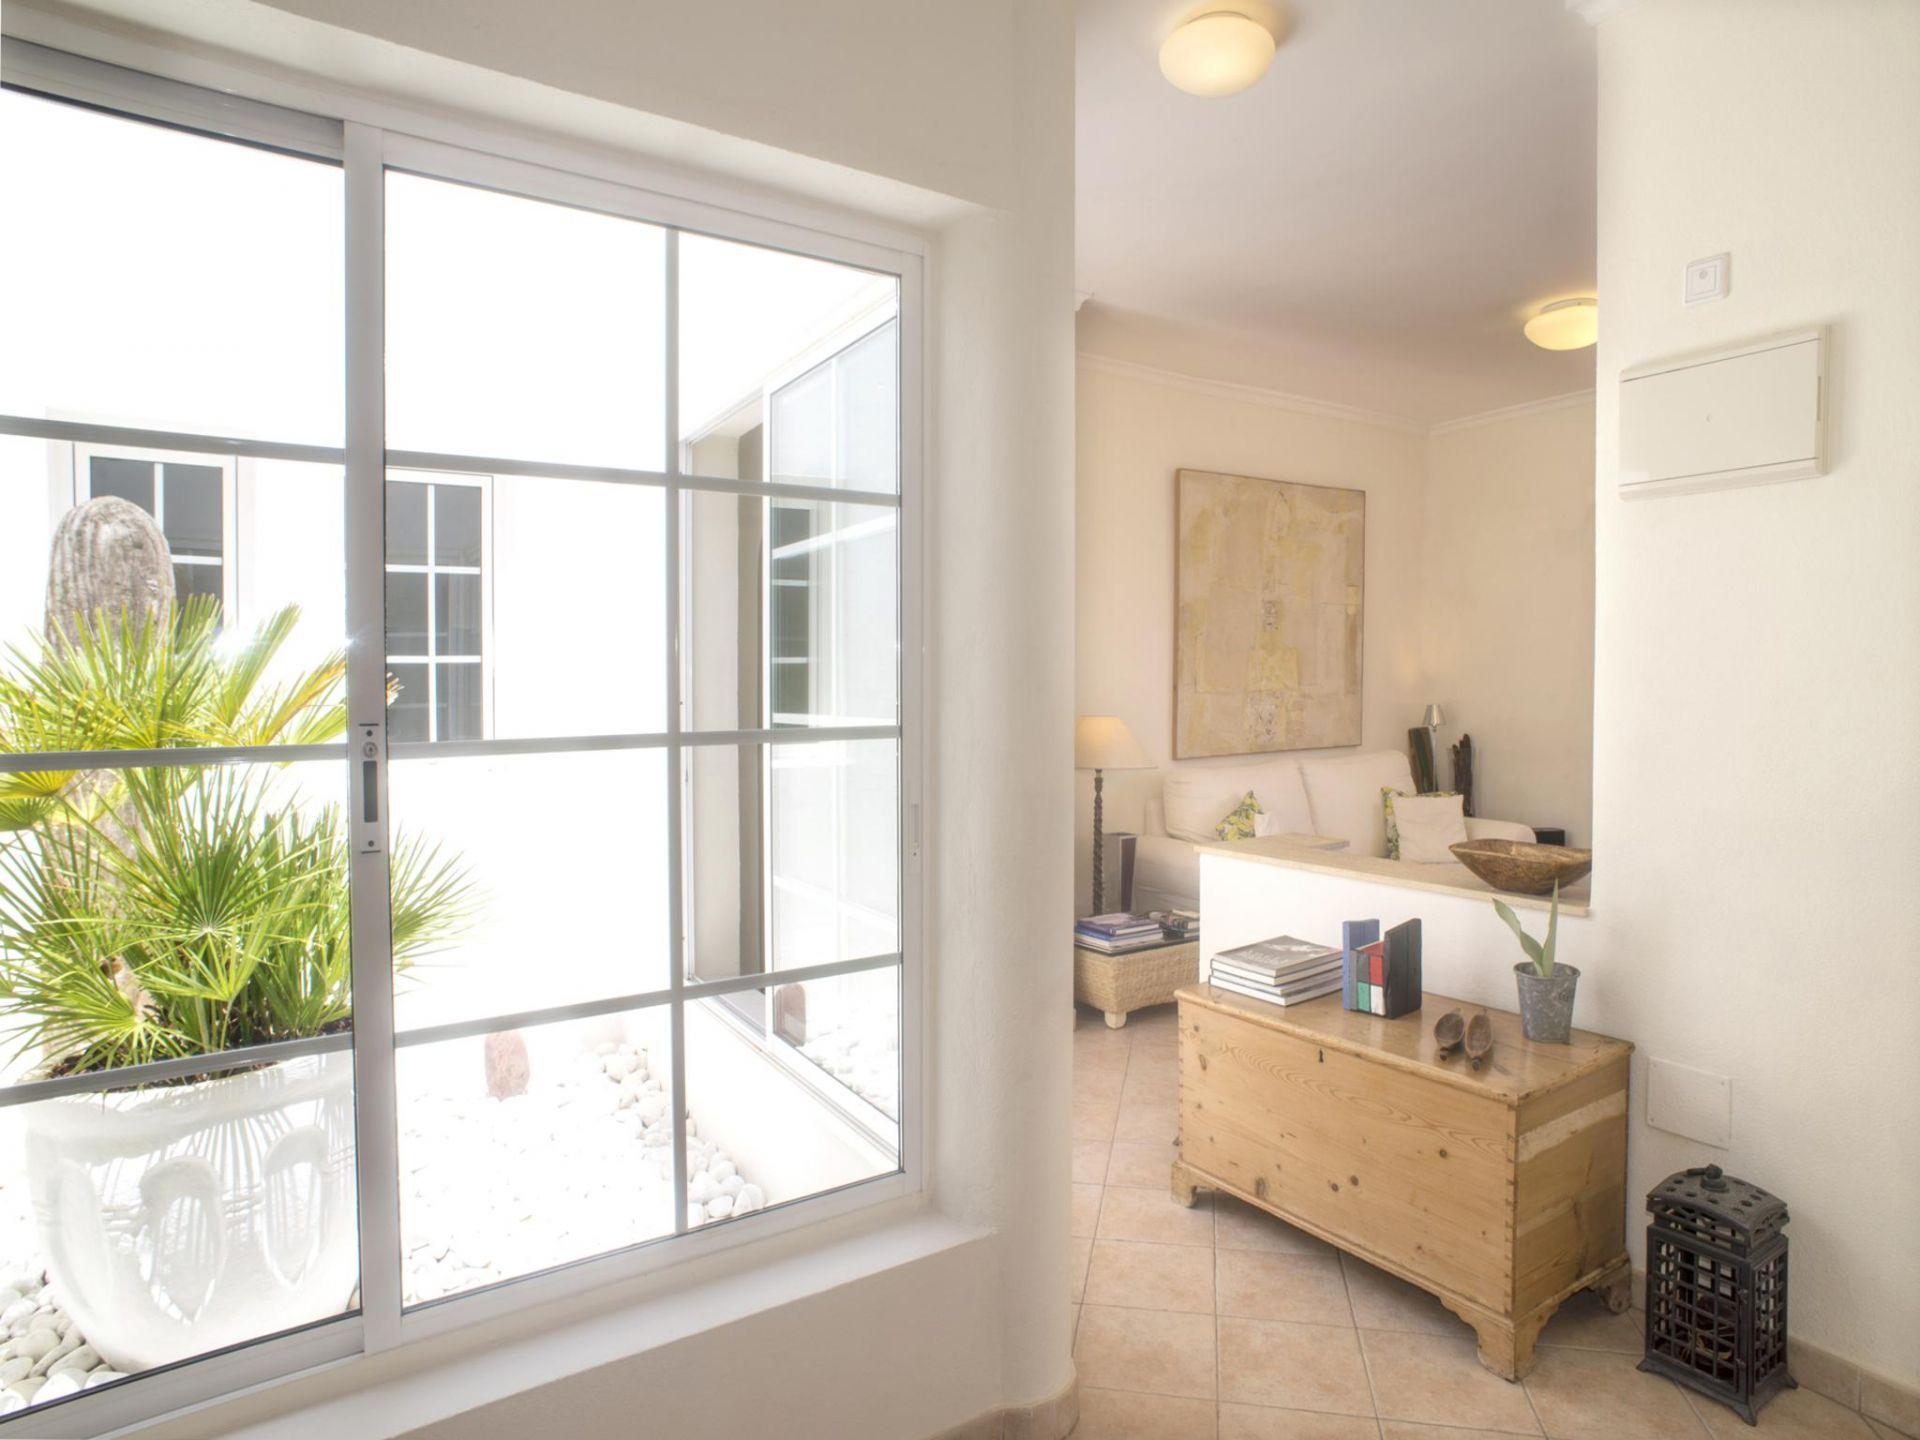 Holiday apartment Villa San Agustin 10 - Holiday Rental (854295), Maspalomas, Gran Canaria, Canary Islands, Spain, picture 15